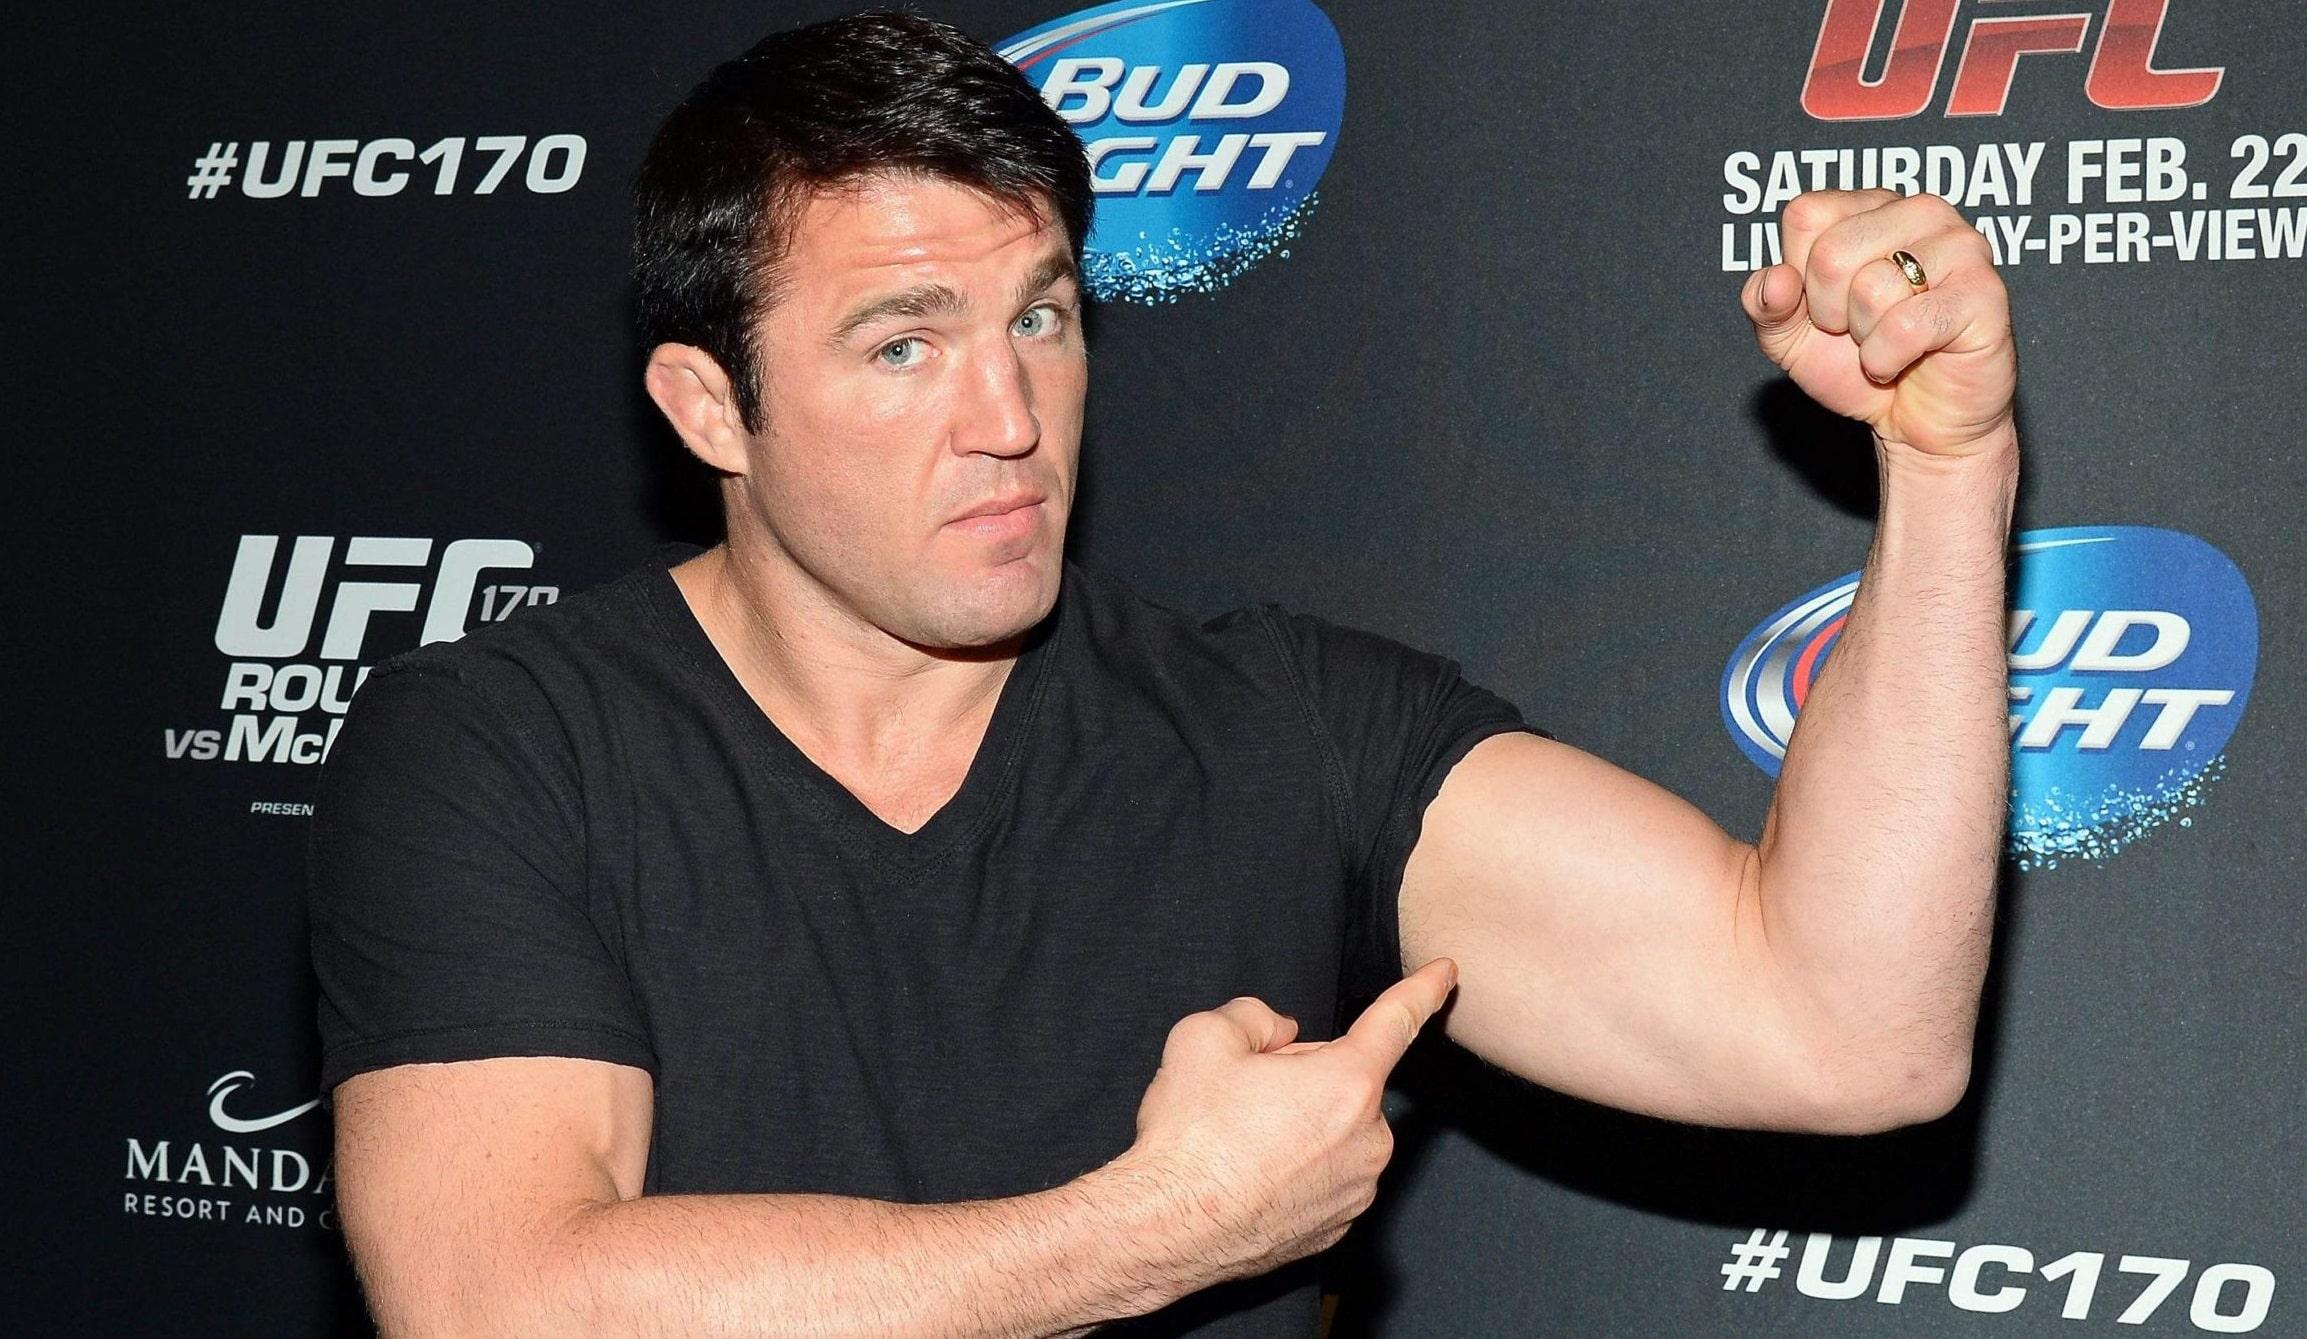 Чейл Соннен - боец MMA: биография, карьера в UFC, видео и статистика боёв